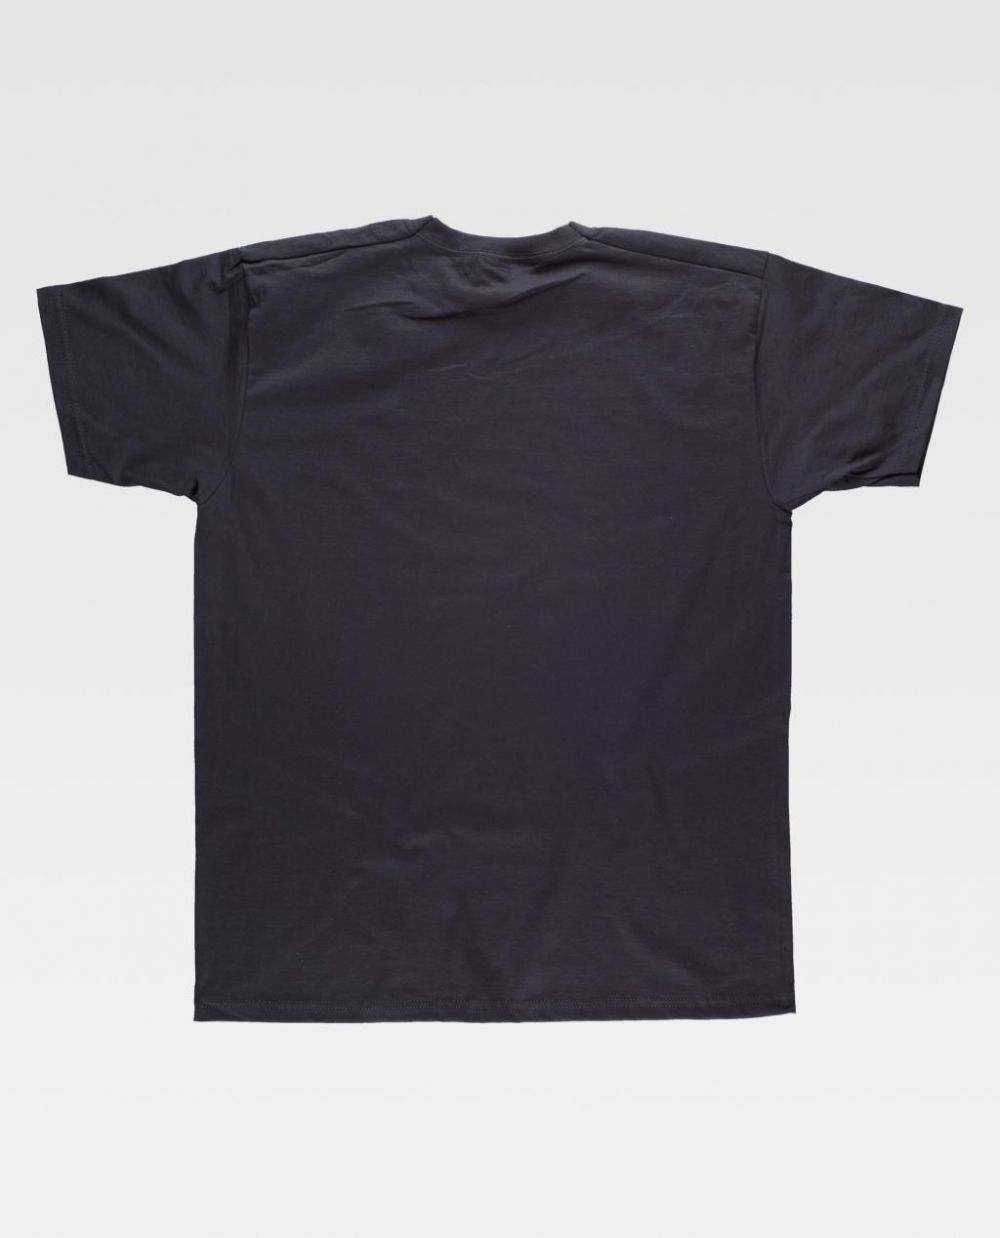 Camisetas de trabajo workteam clasica manga corta algodon vista 2